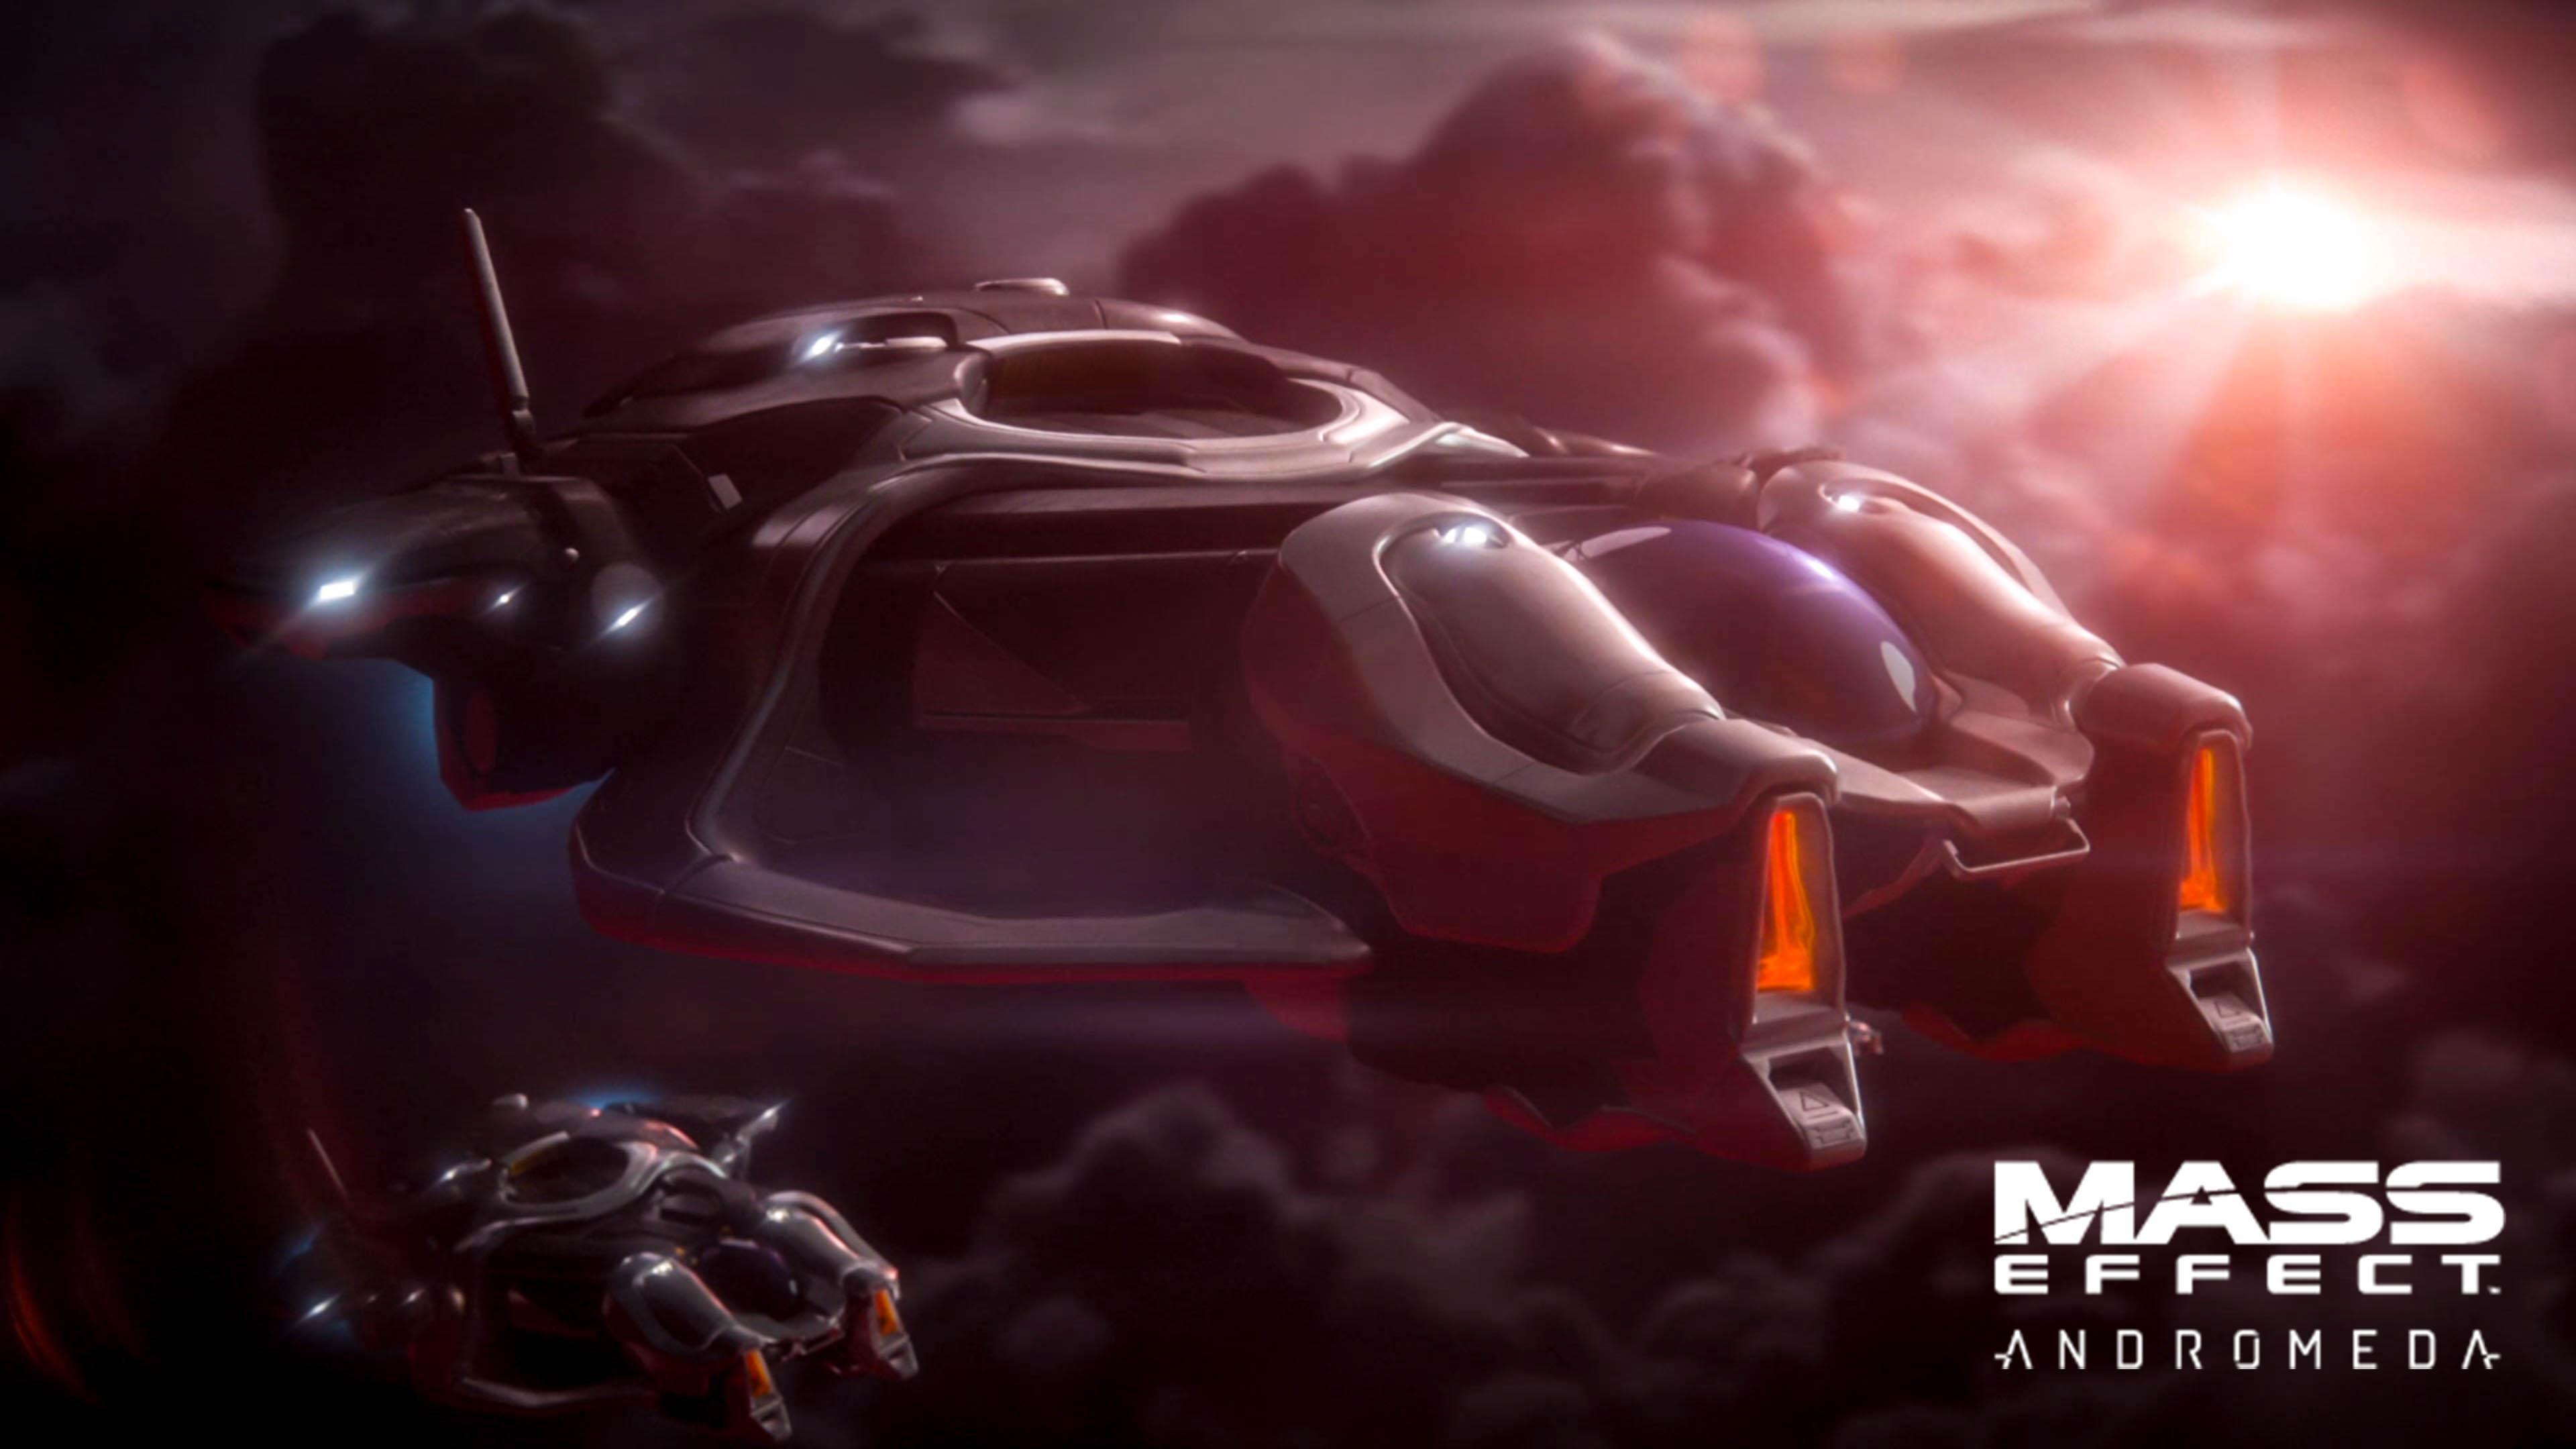 Mass Effect Andromeda X5 Ghost: Mass Effect Andromeda: In Una Cut Scene Spunta Un Fucile